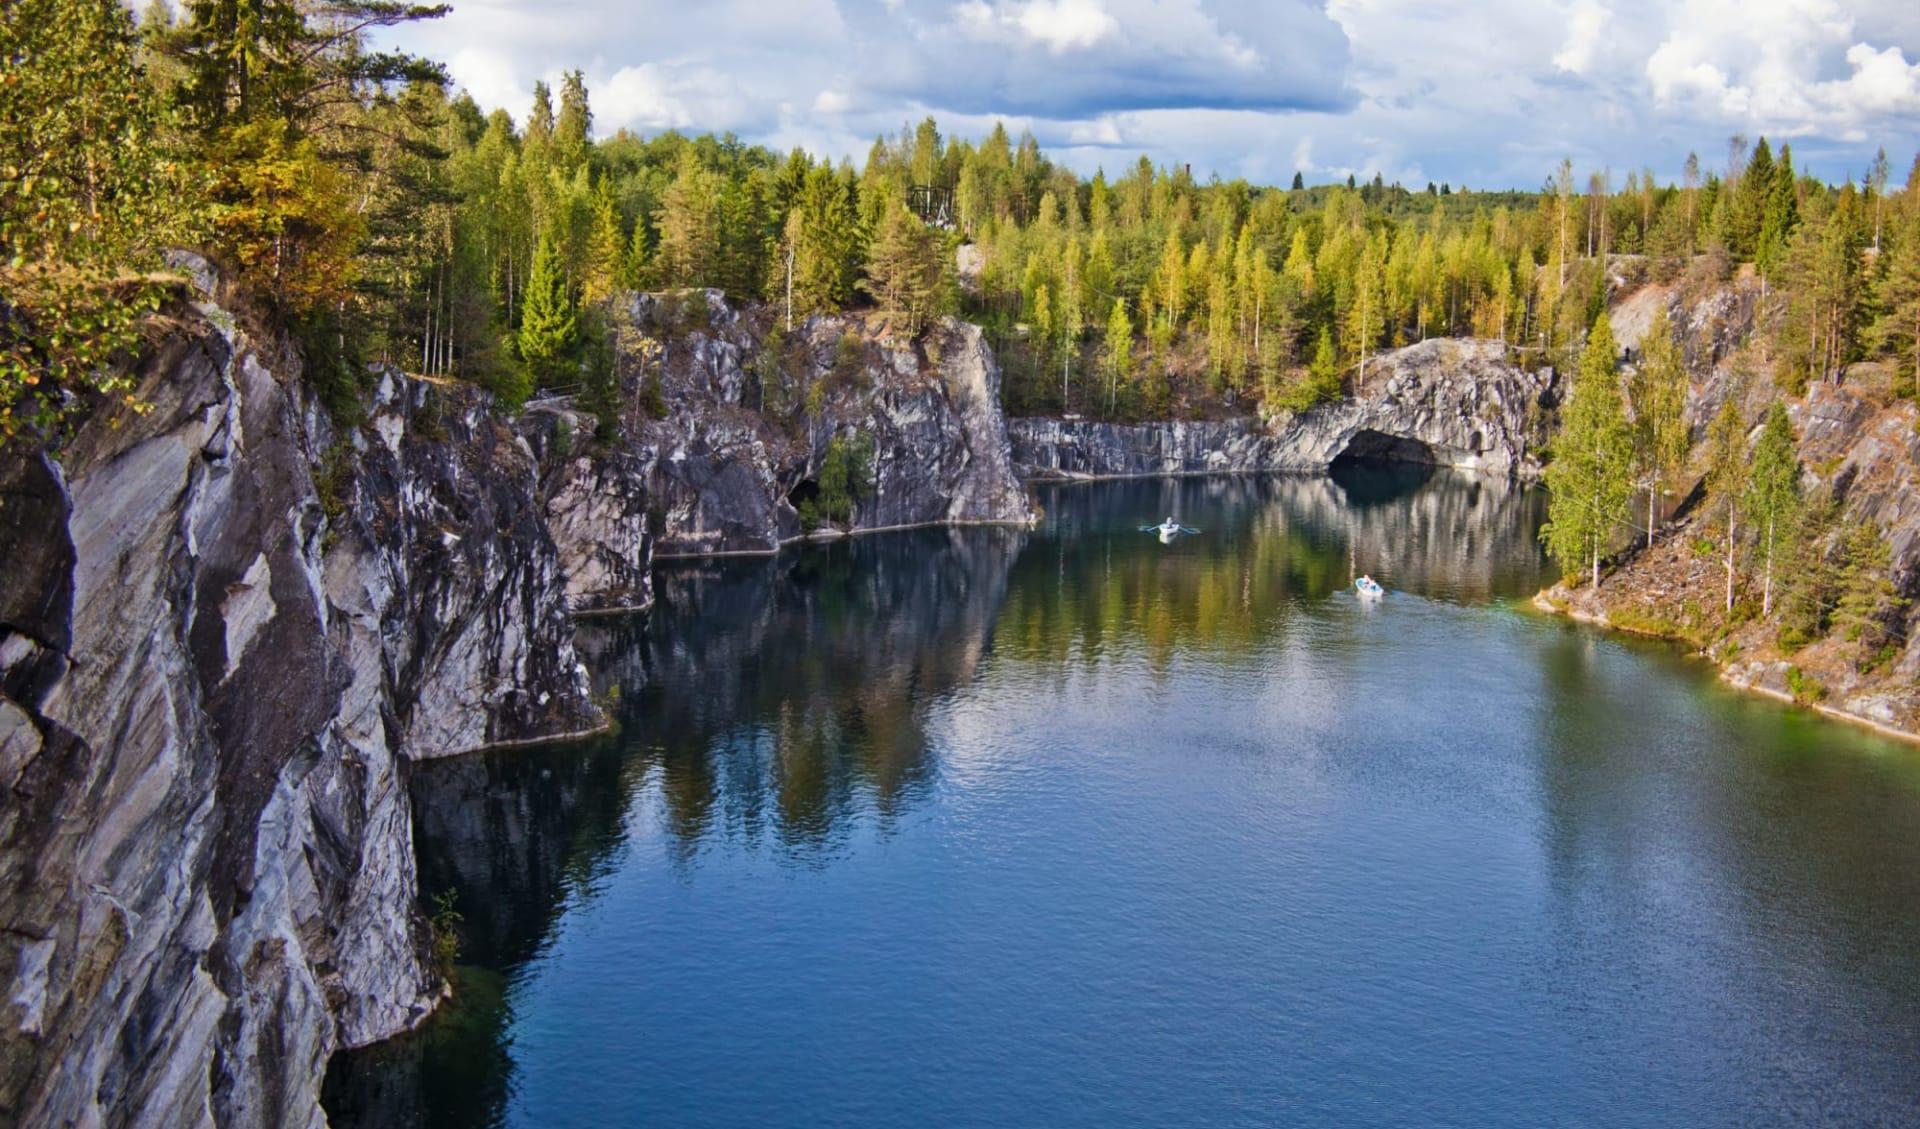 Abenteuer Karelien ab St. Petersburg: Russland_Ruskeala_Marmorstein_